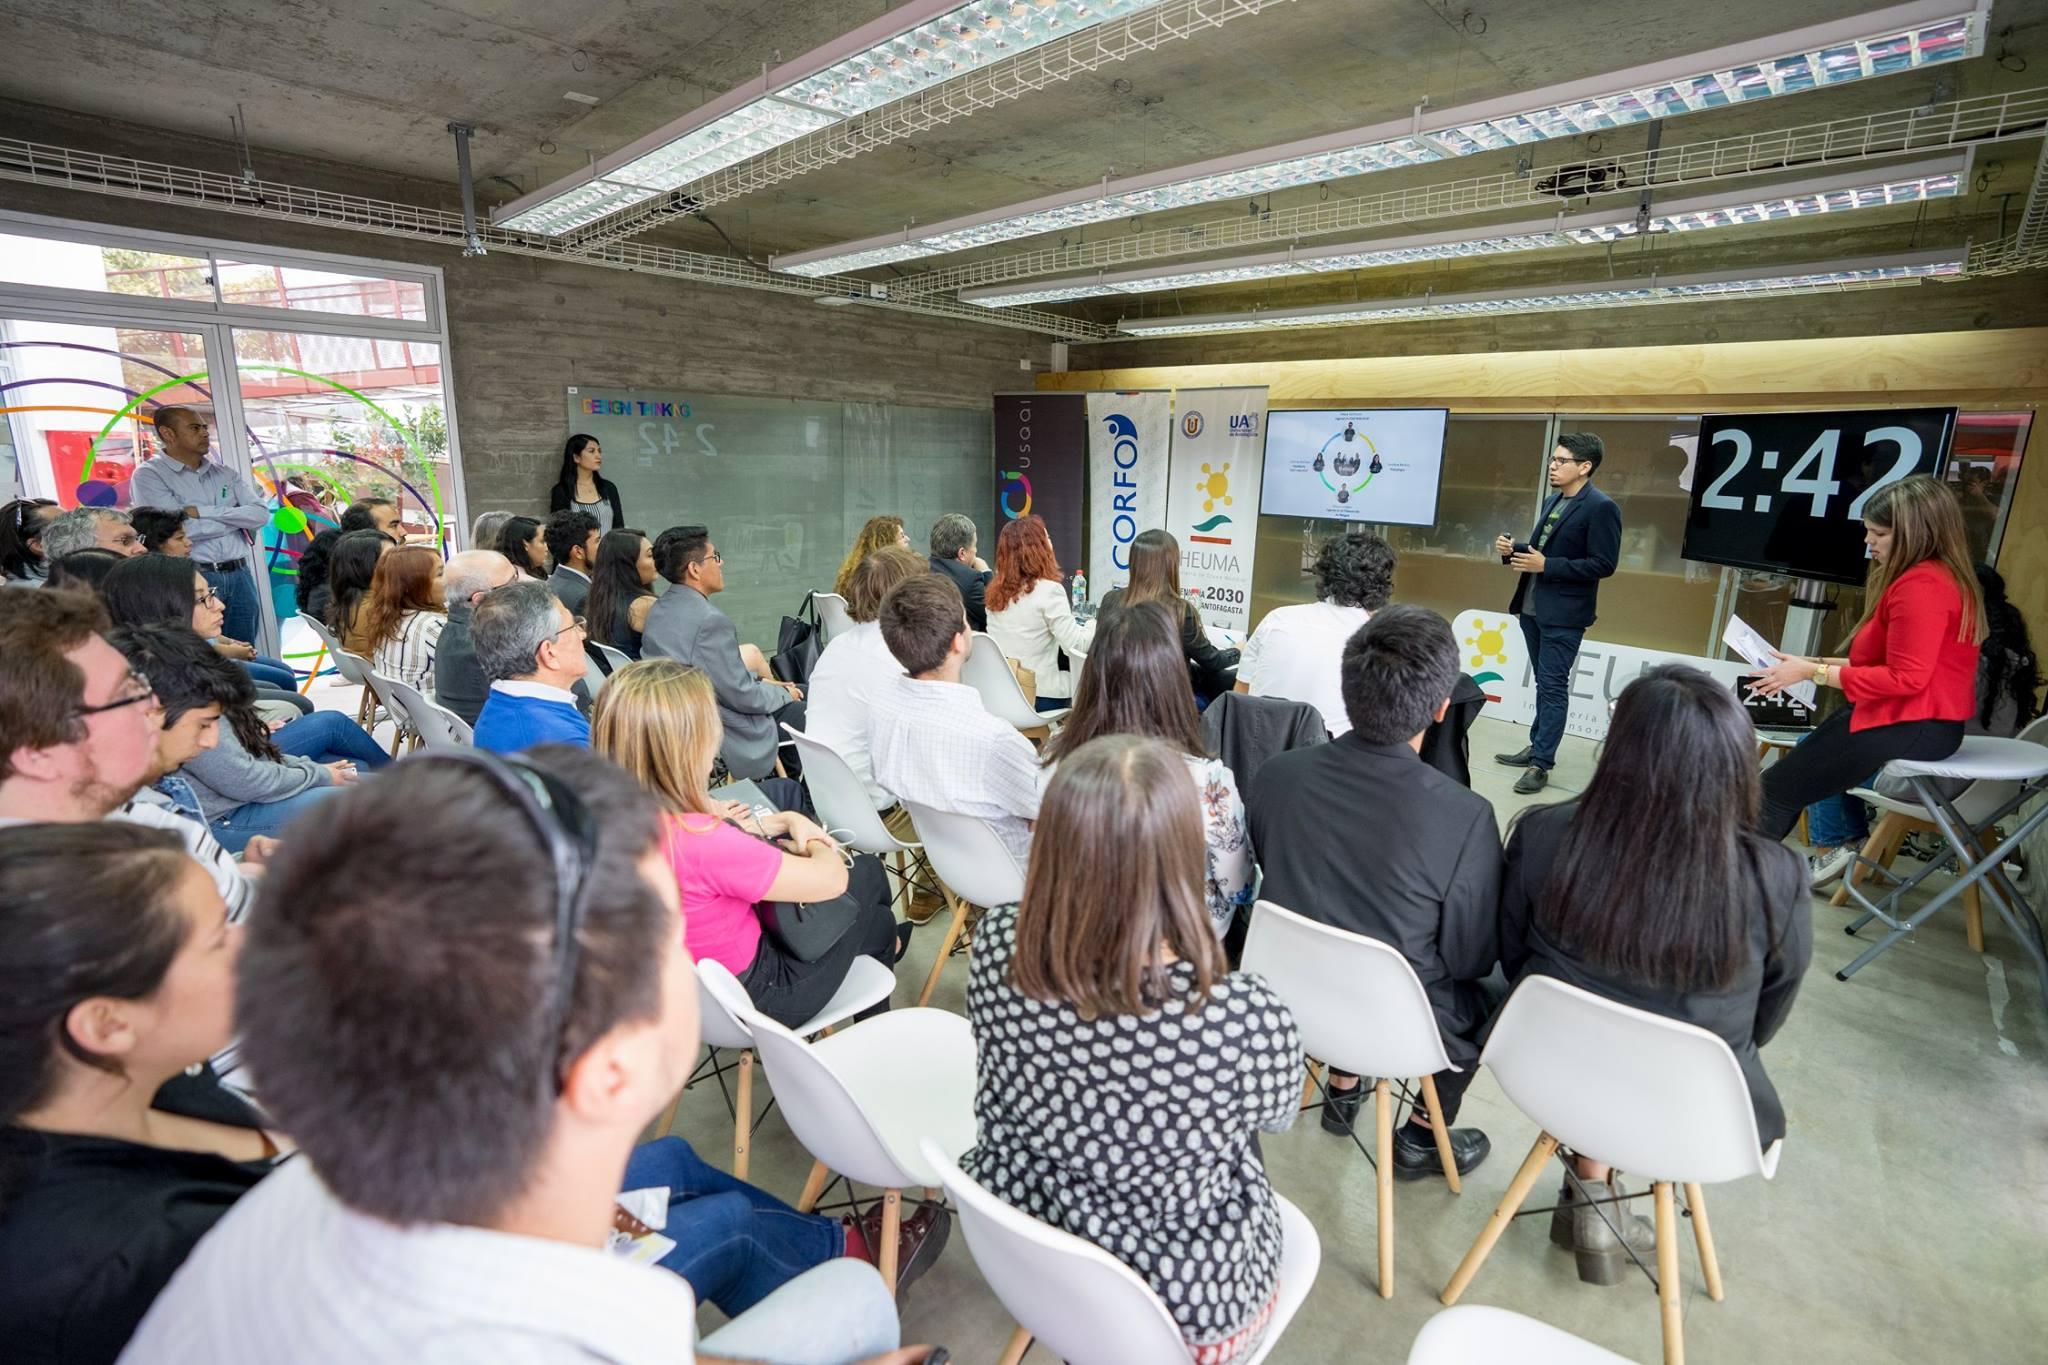 Entérate acerca de los talleres formativos para seleccionados del 2do Concurso Desafío 2030 HEUMA